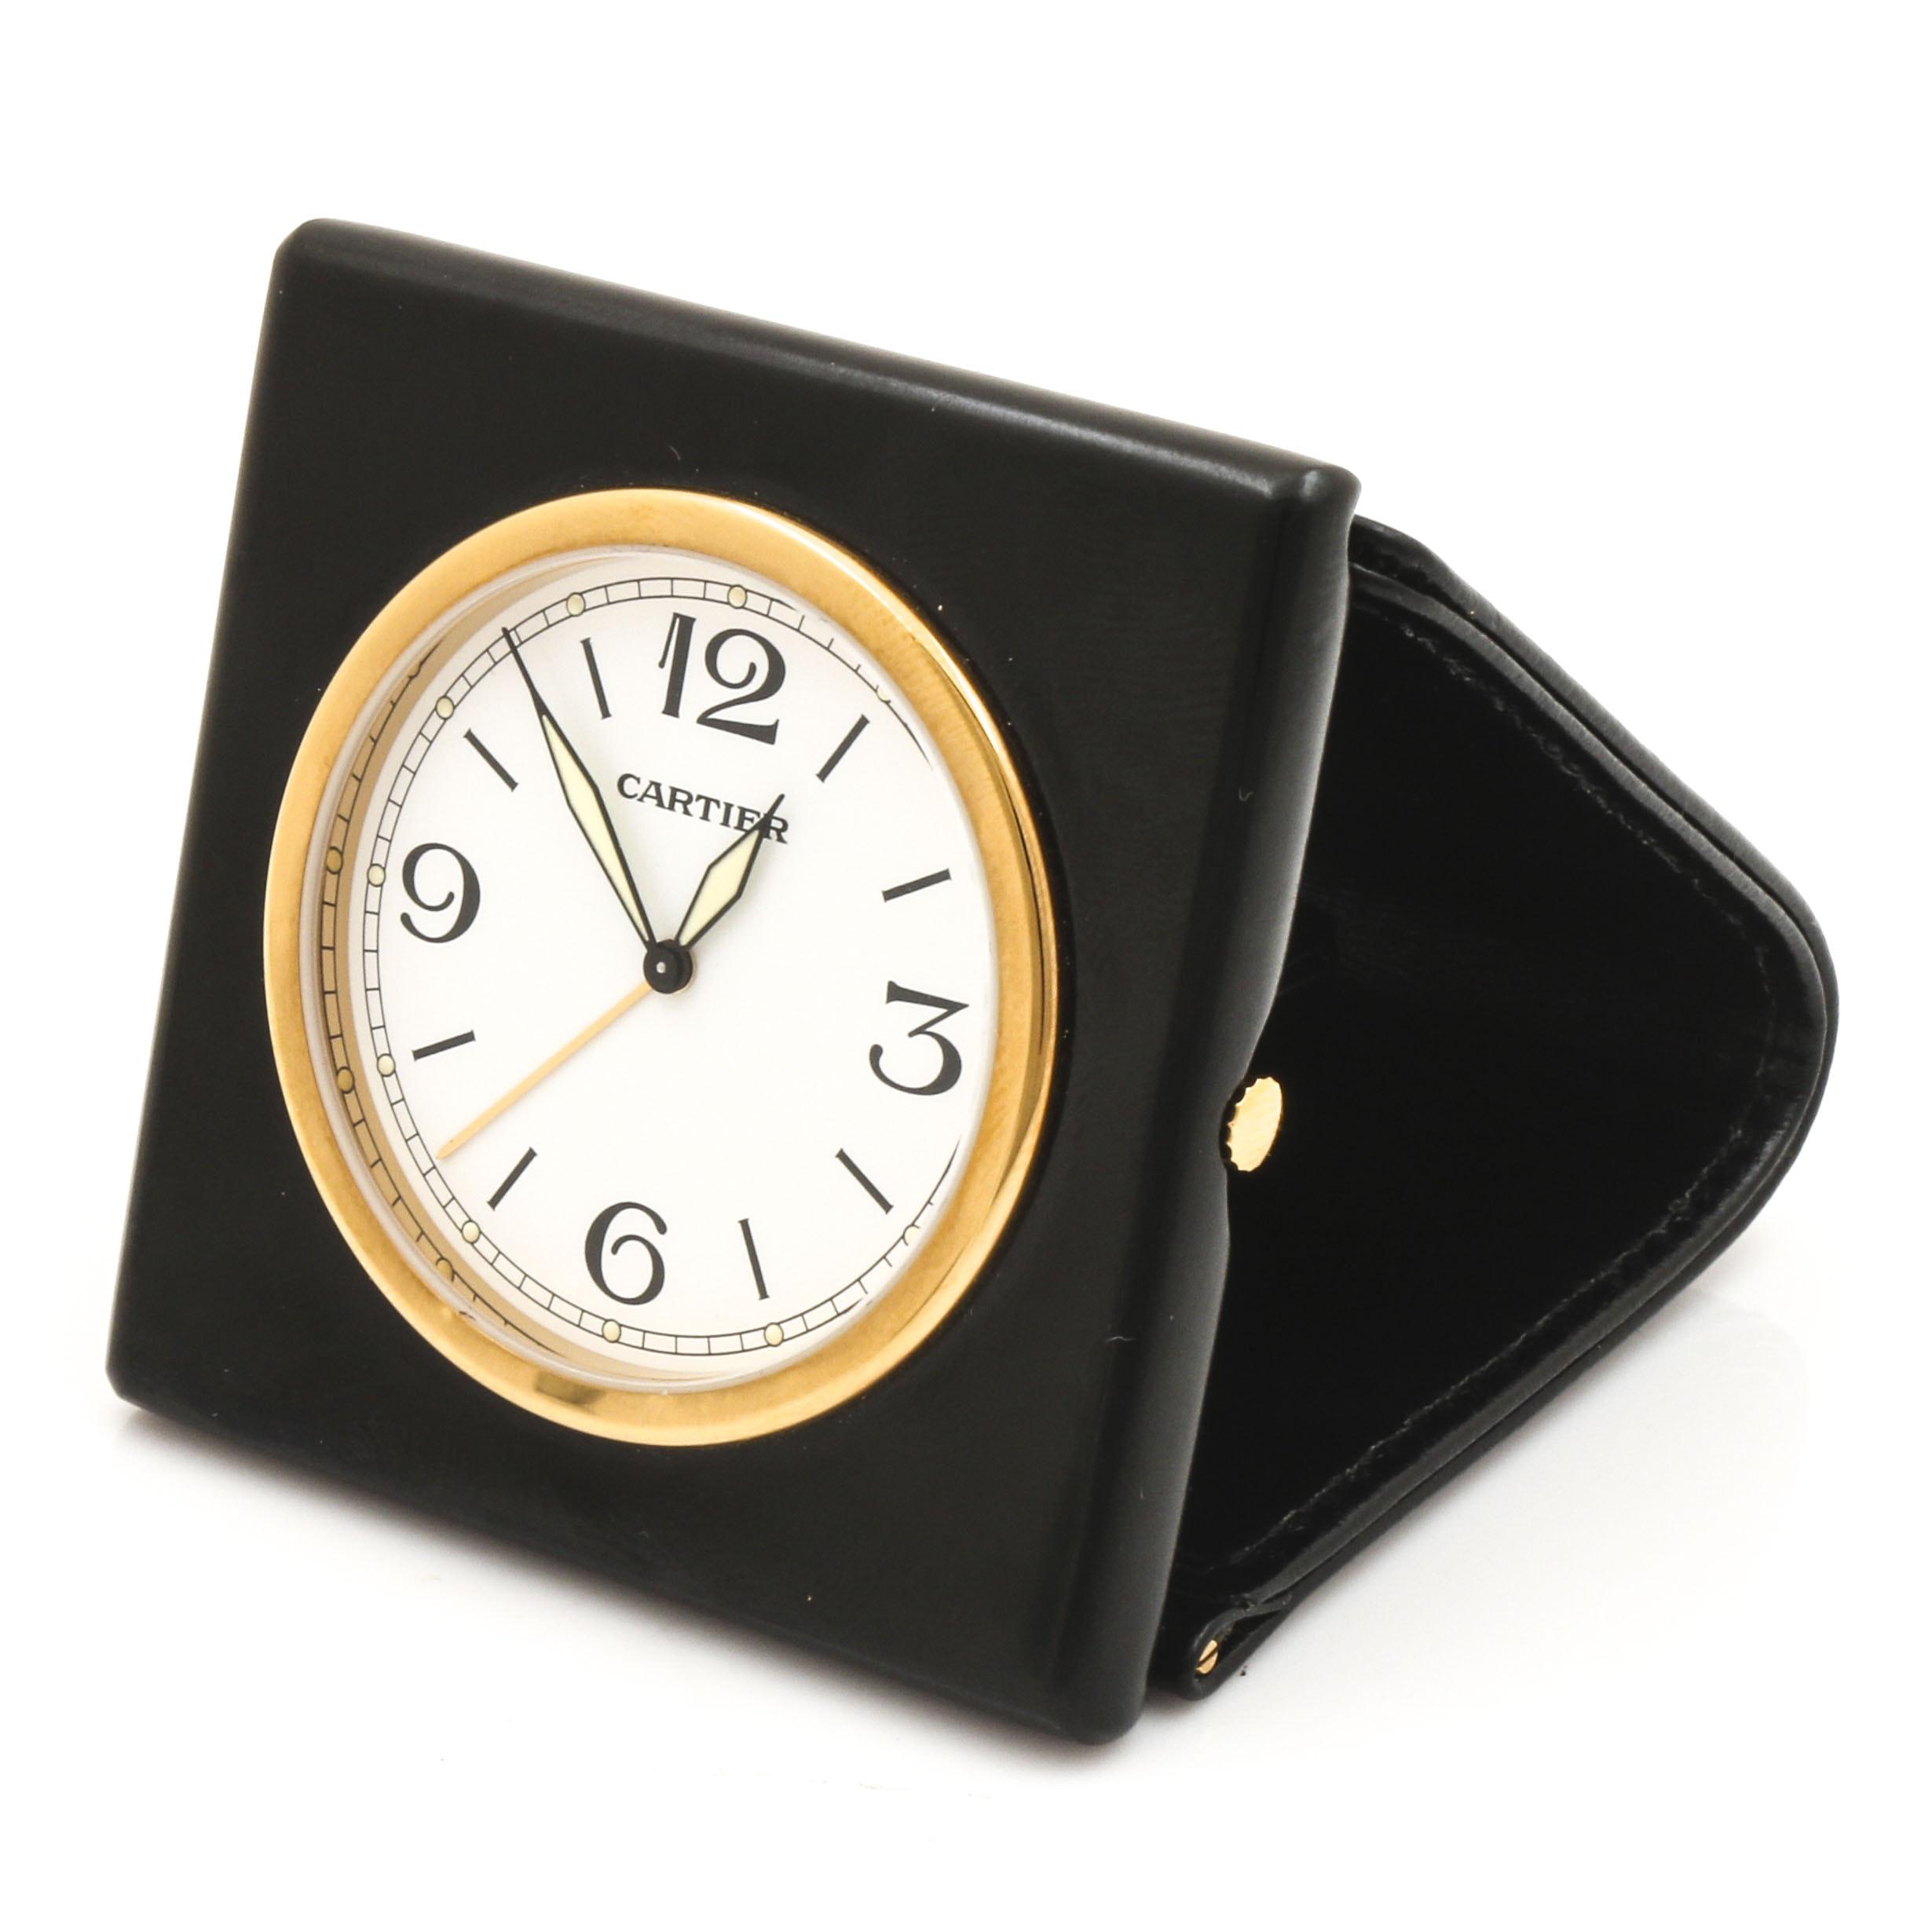 Cartier Travel Analog Alarm Clock